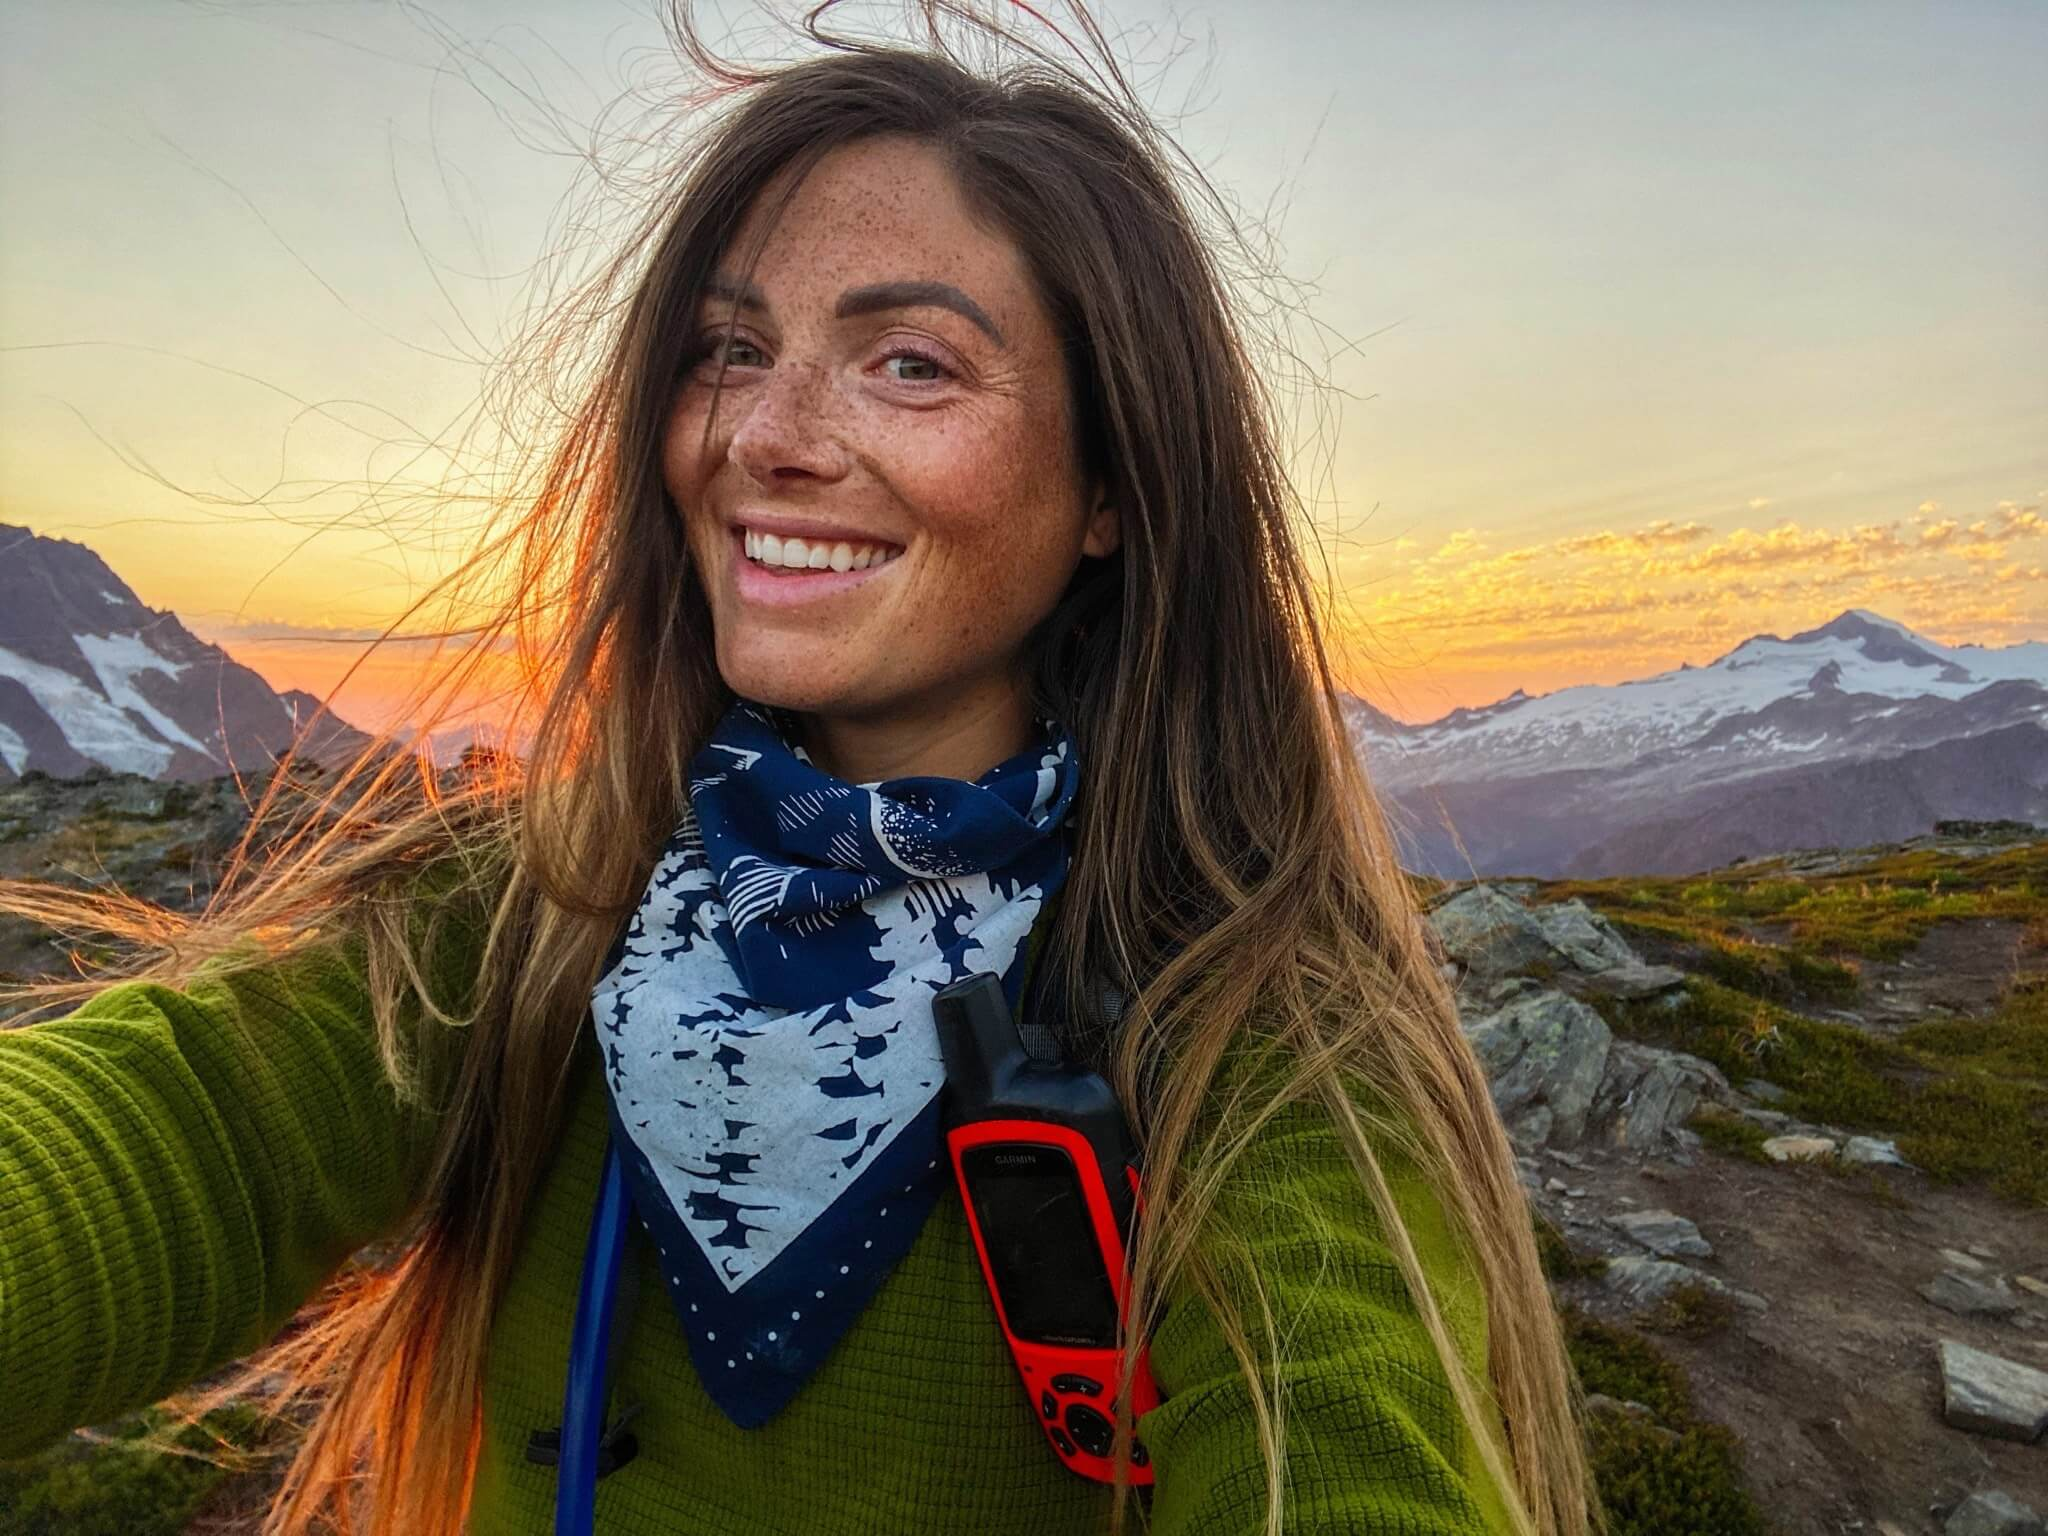 Woman smiling on mountain top